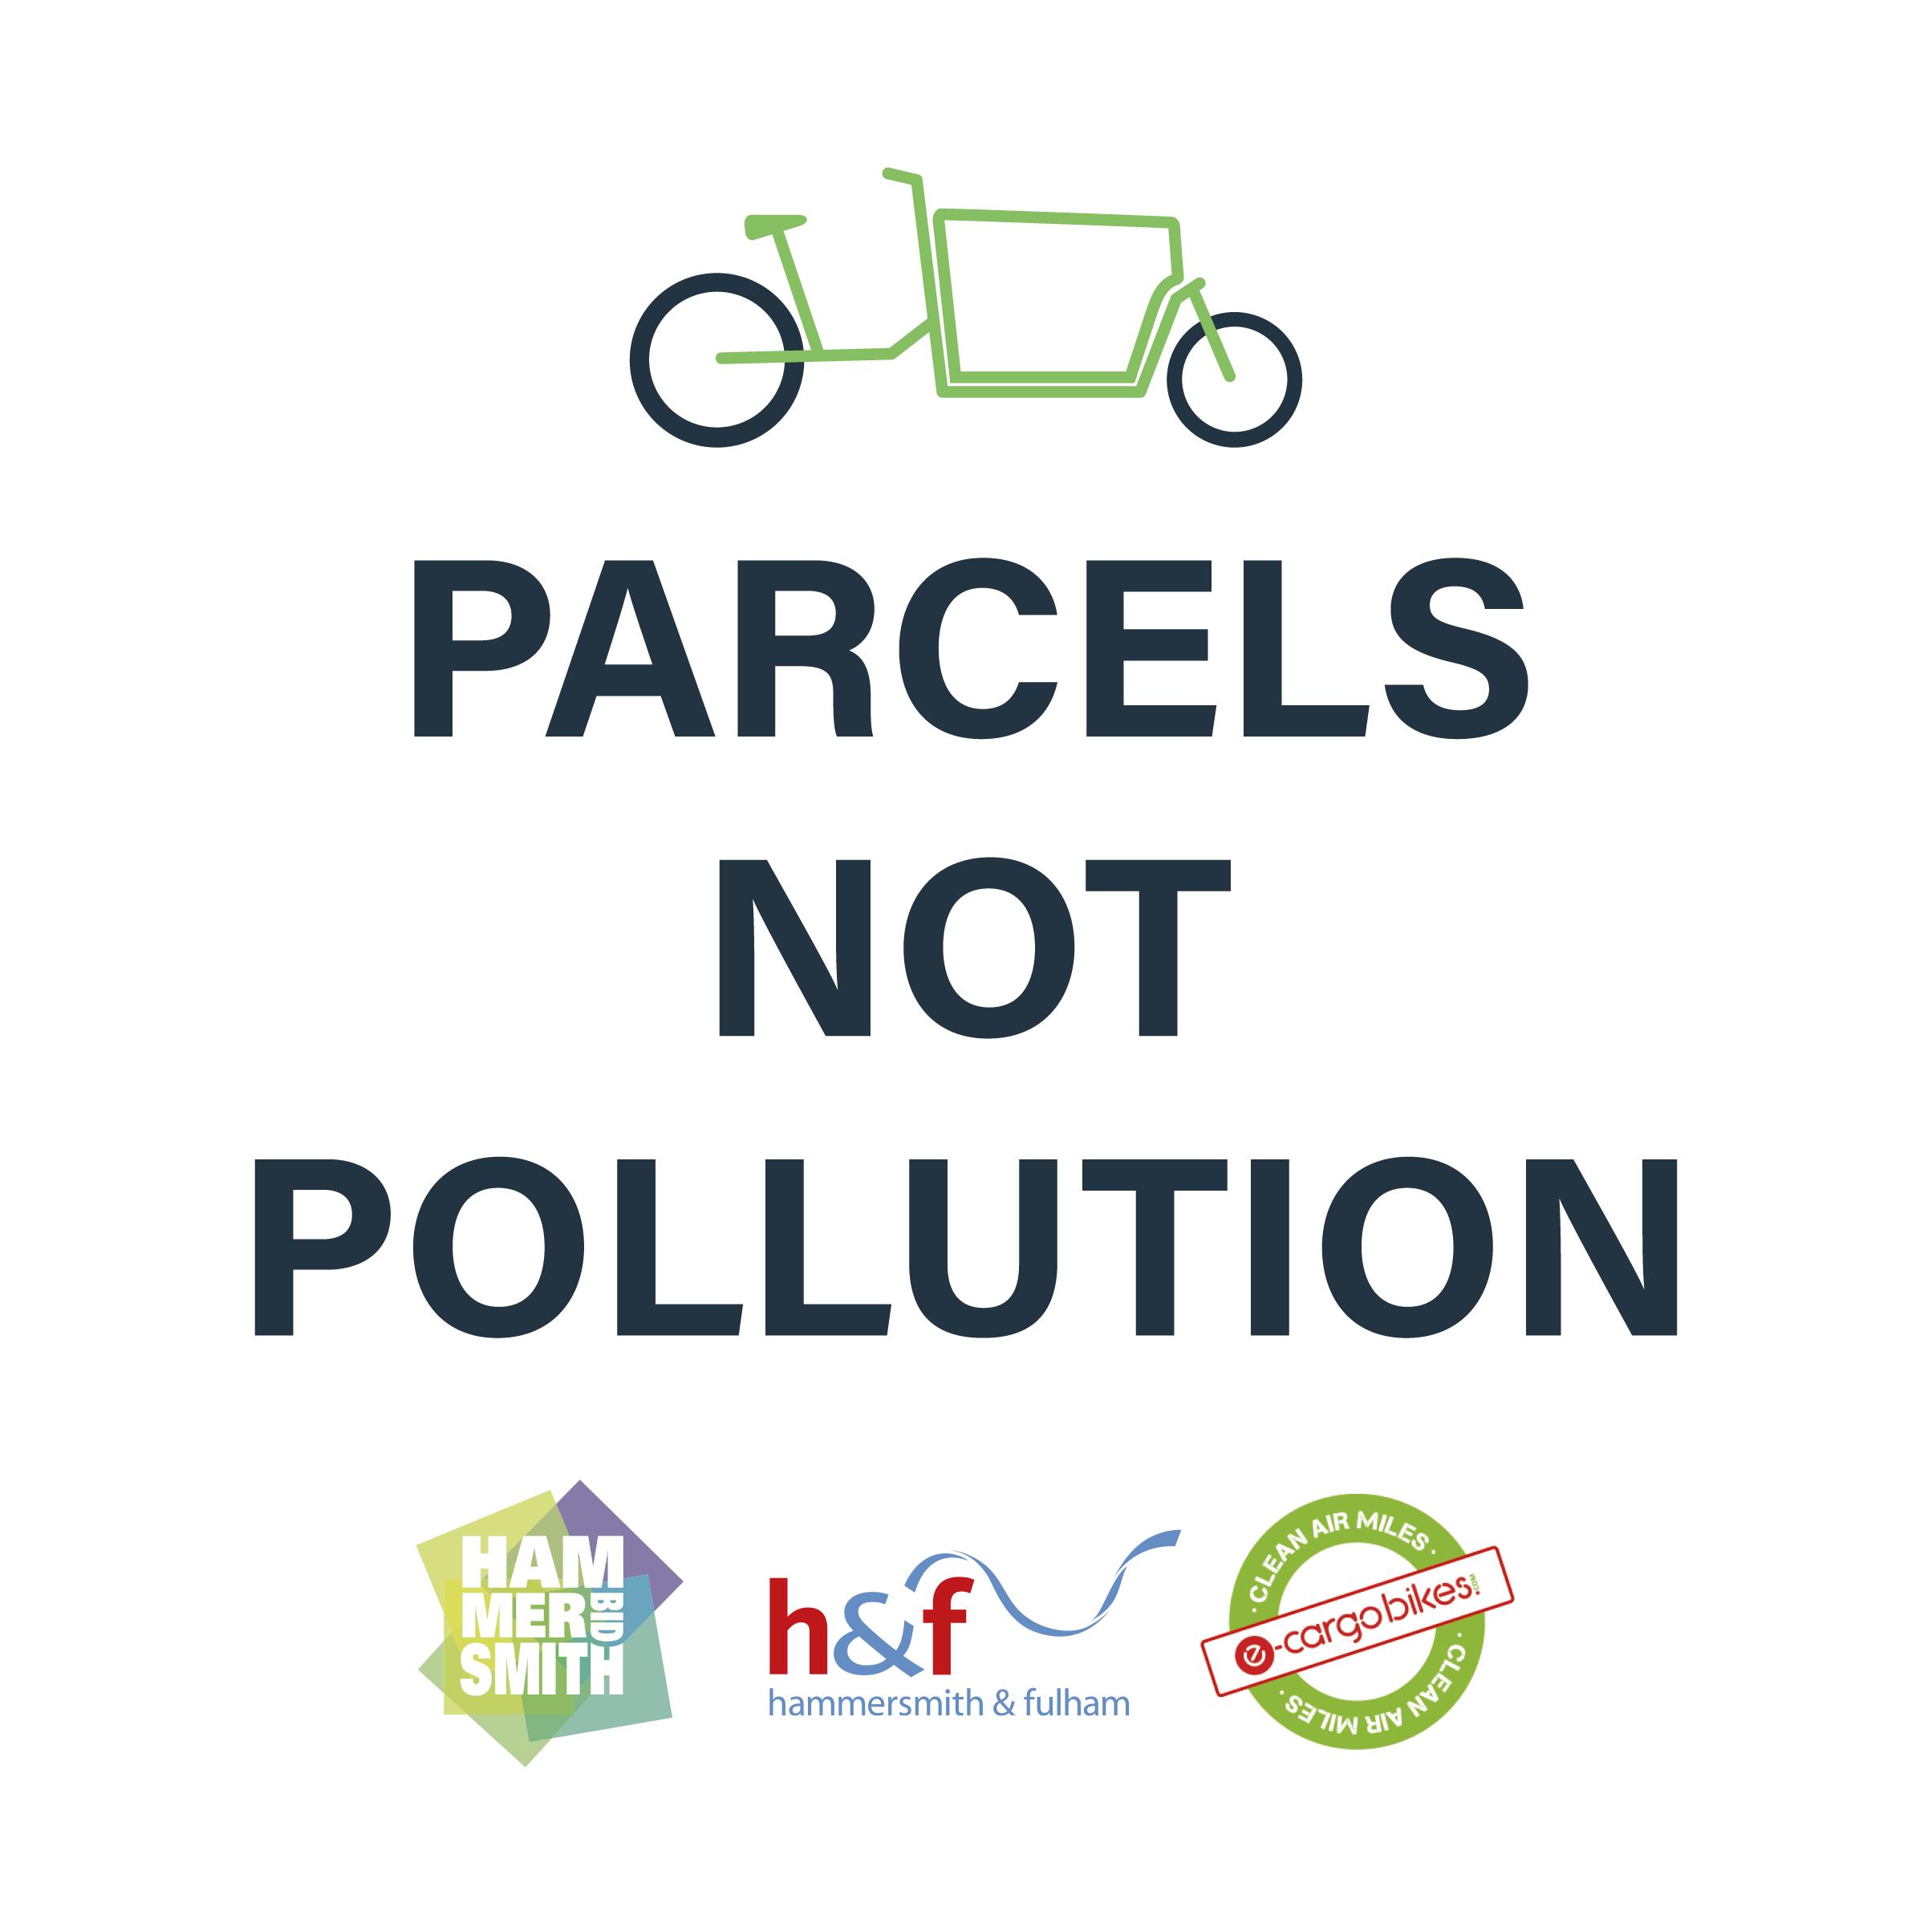 Parcels Not Pollution